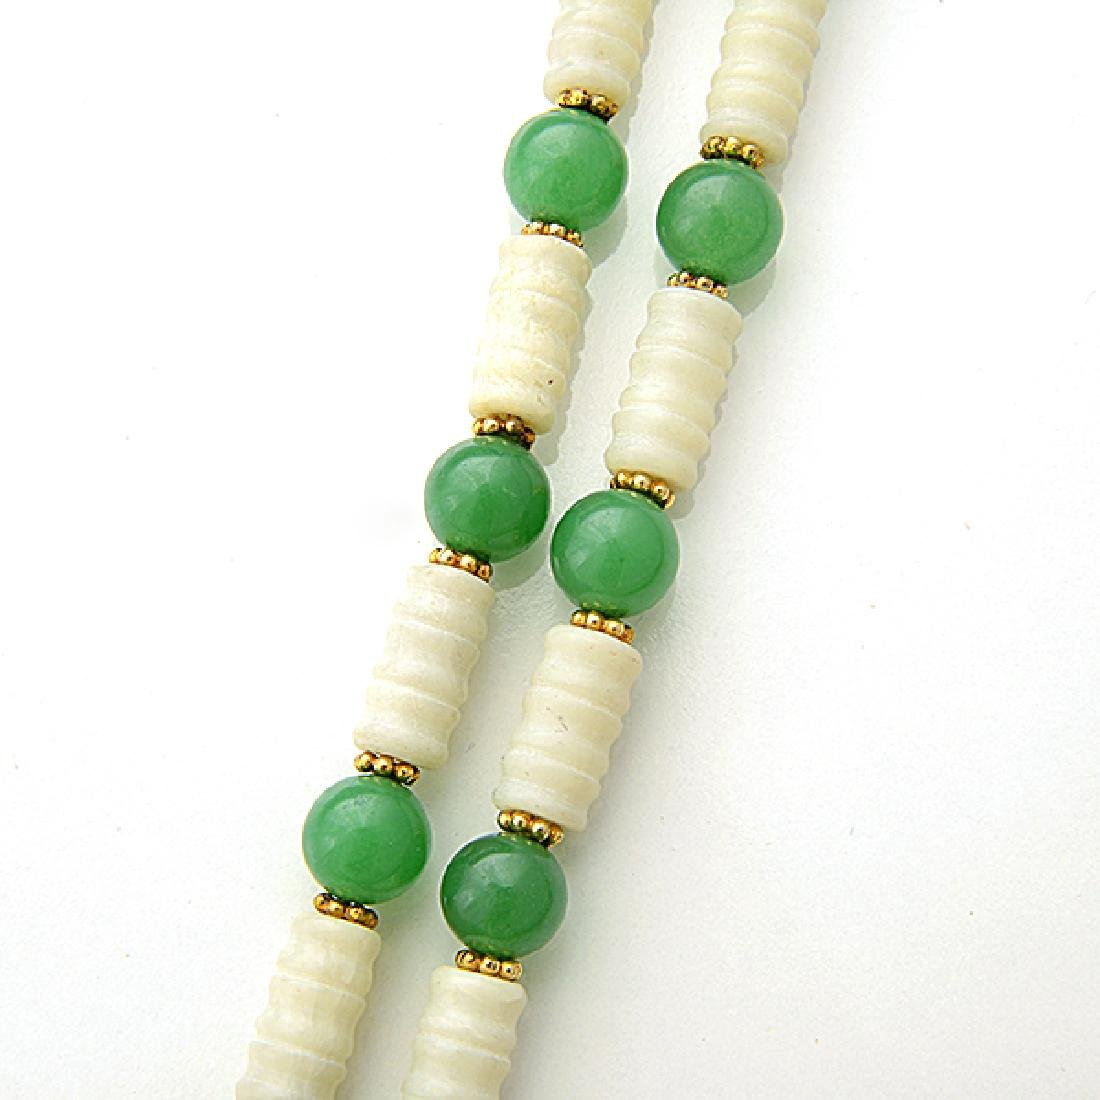 Jade, Quench Crackled Quartz, Vermeil Necklace. - 4